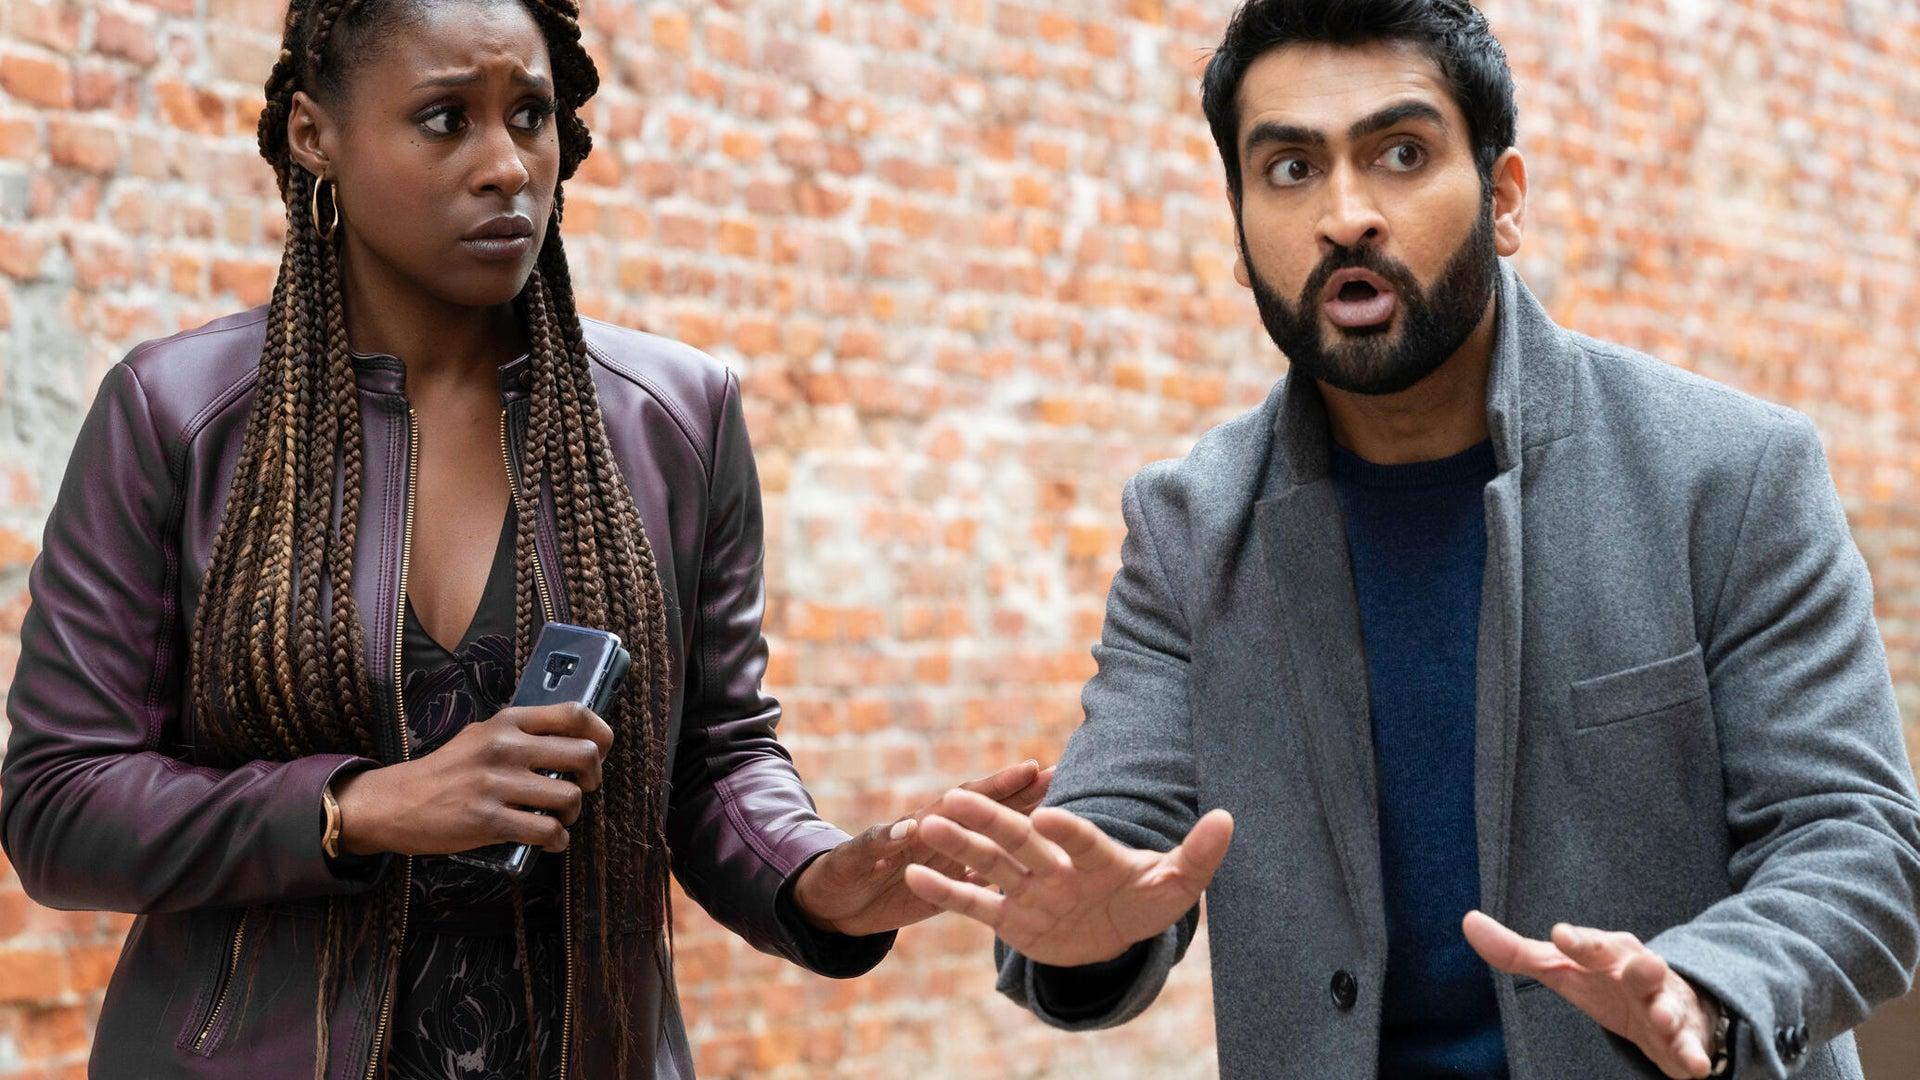 Issa Rae and Kumail Nanjiani, The Lovebirds